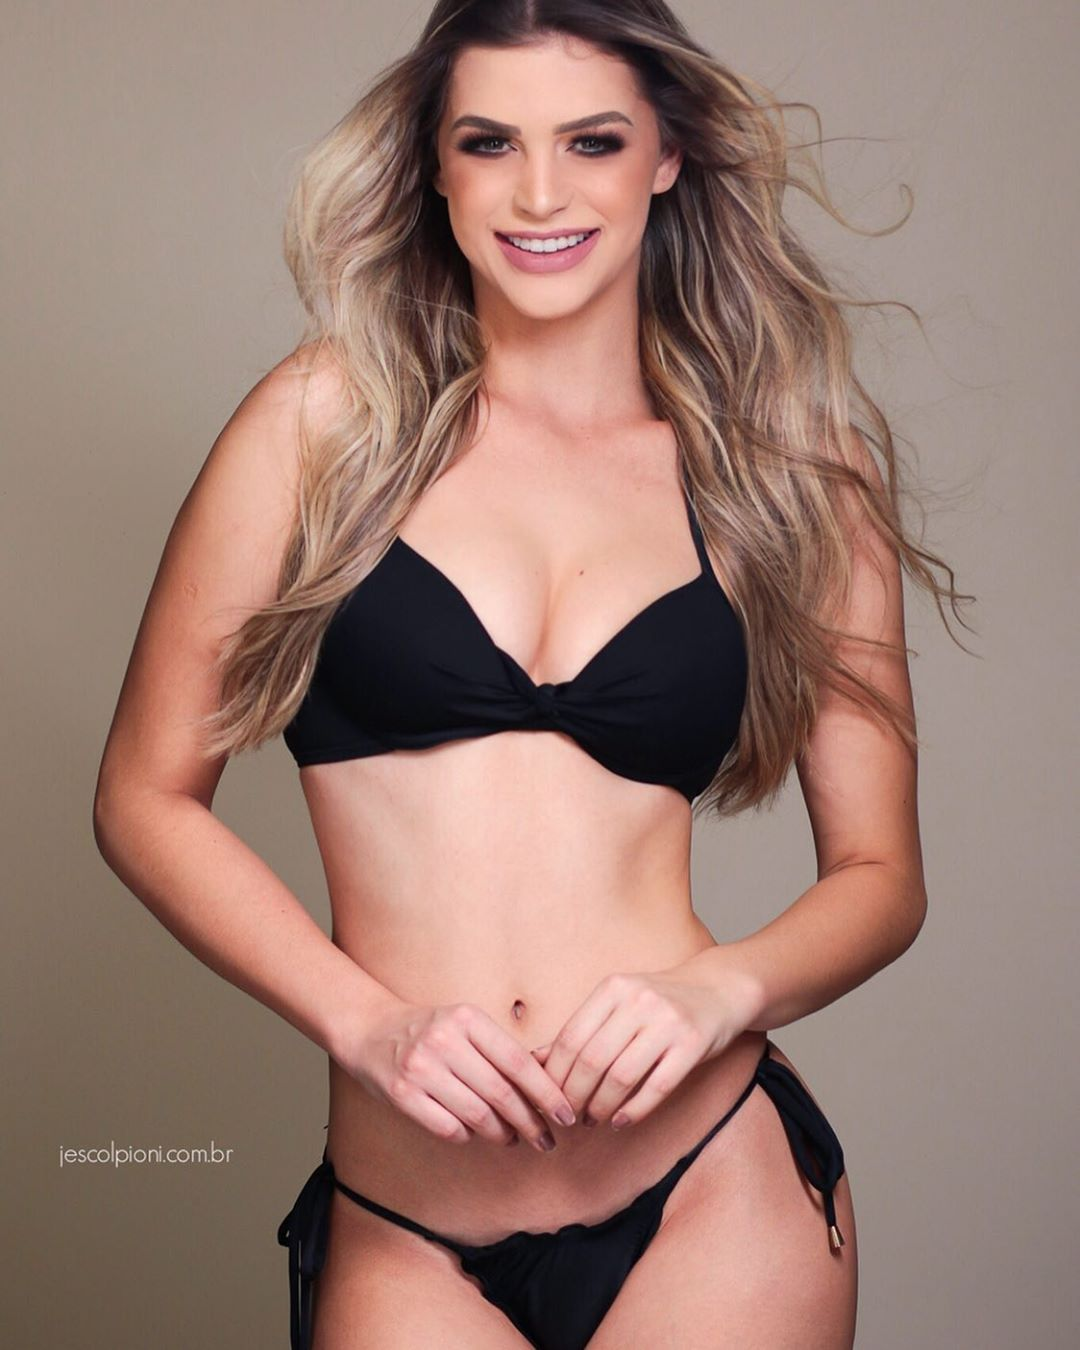 maria gabriela batistela, miss brasil terra 2019. 61259610